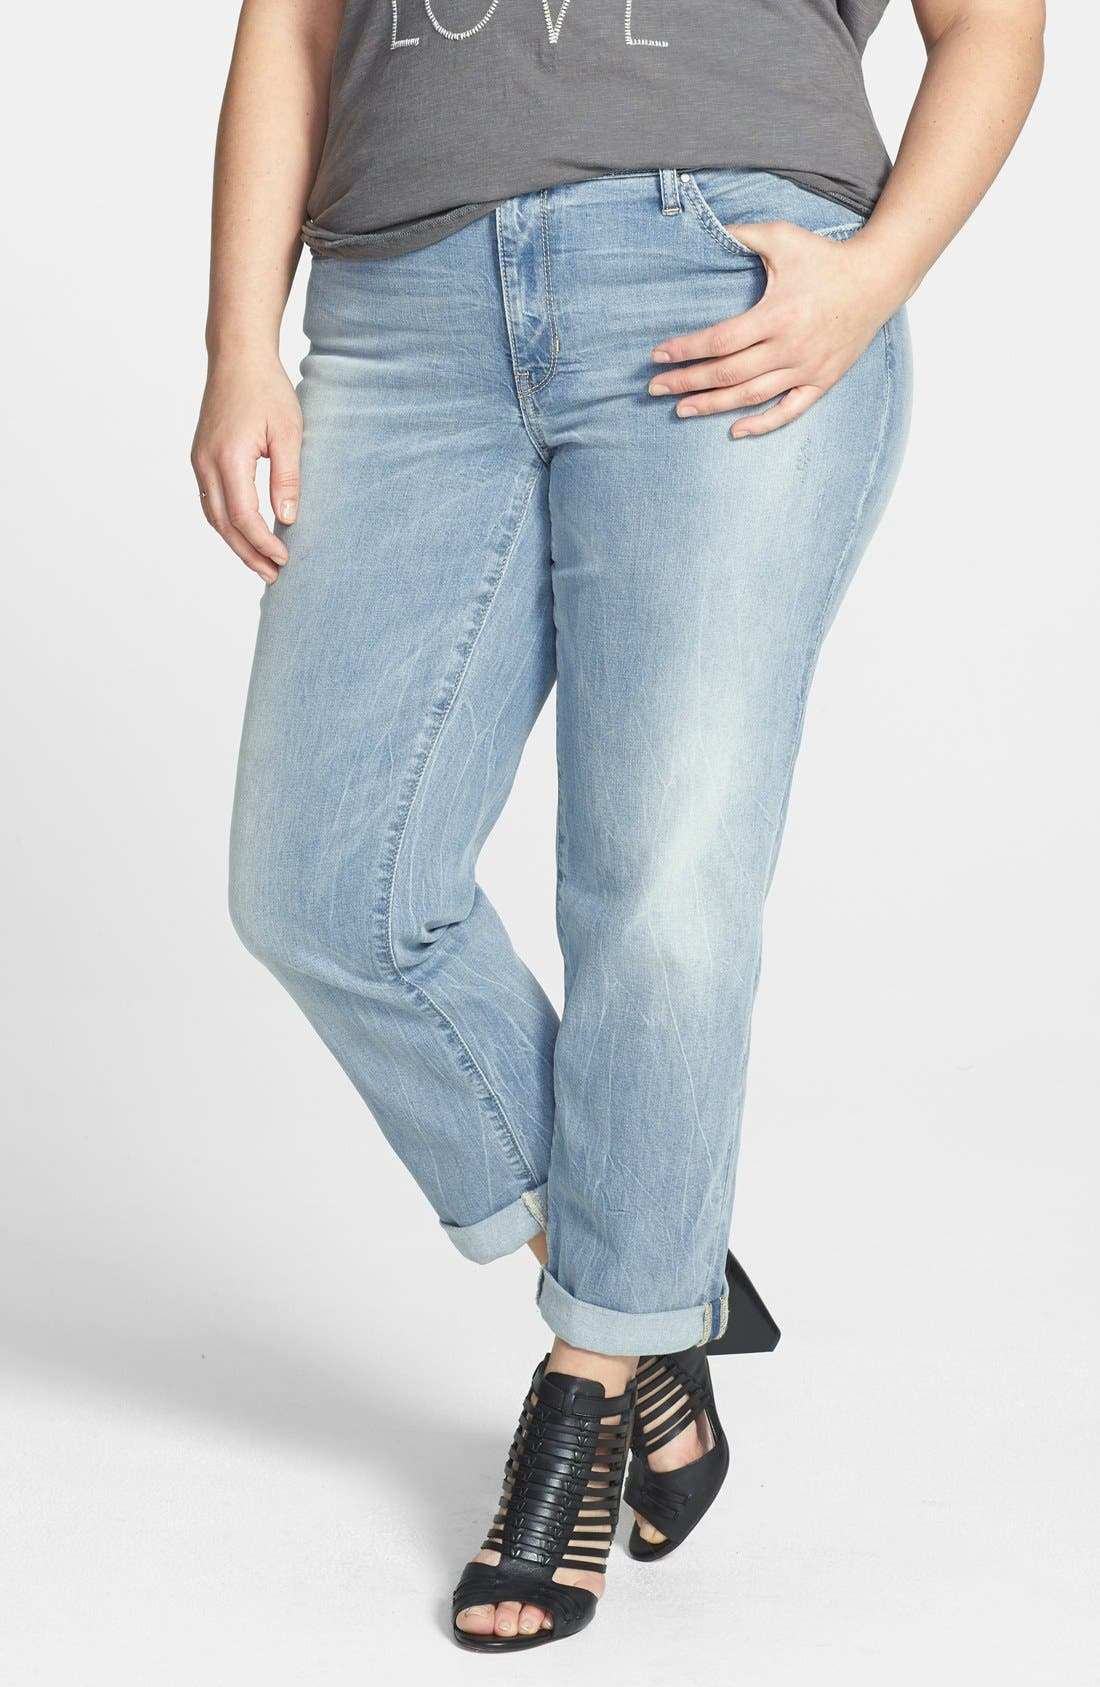 DKNY,                             'Bleecker' Boyfriend Jeans,                             Main thumbnail 1, color,                             400